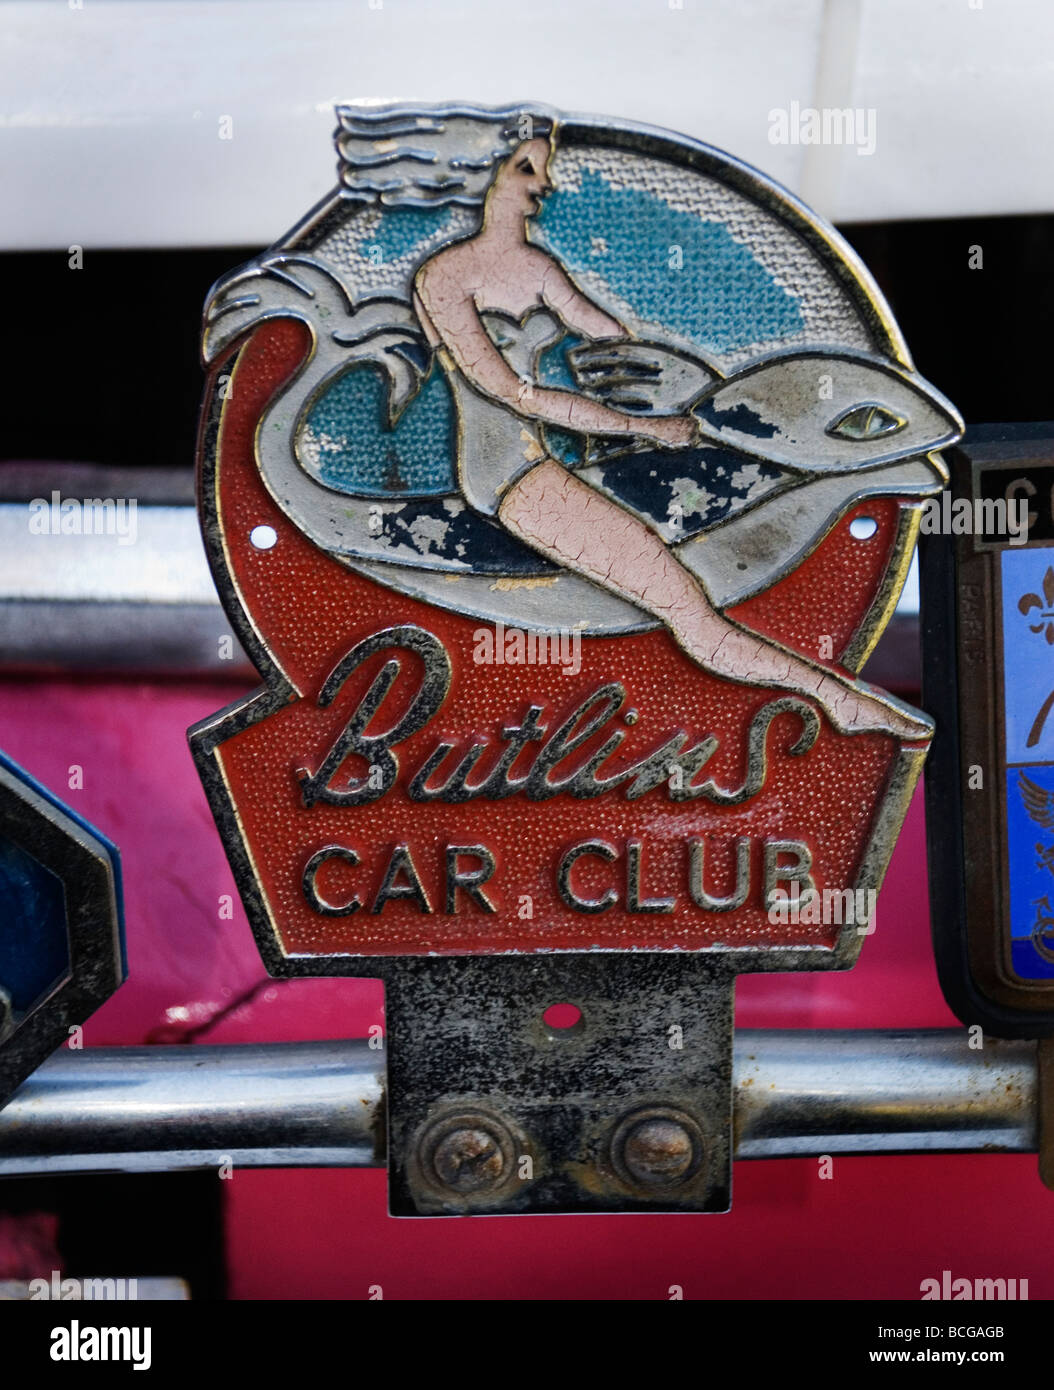 Butlins car club badge - Stock Image